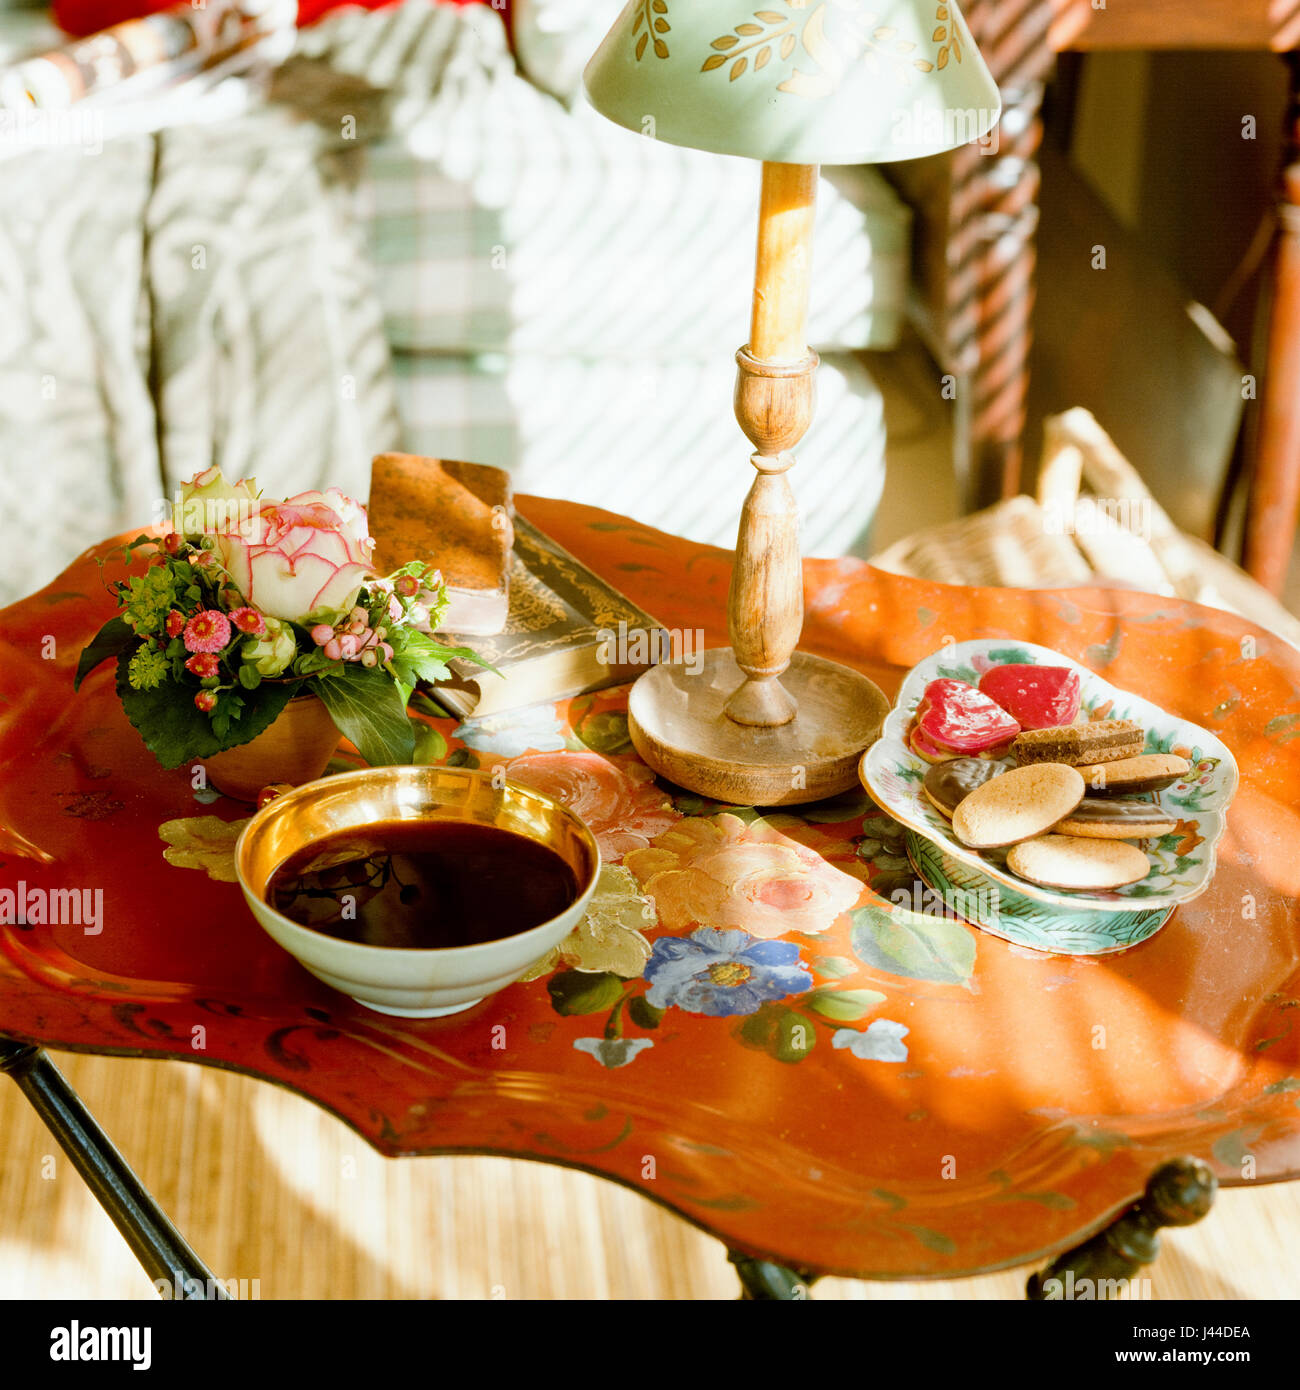 Vintage Table Decor Interiors Retro Photos Vintage Table Decor